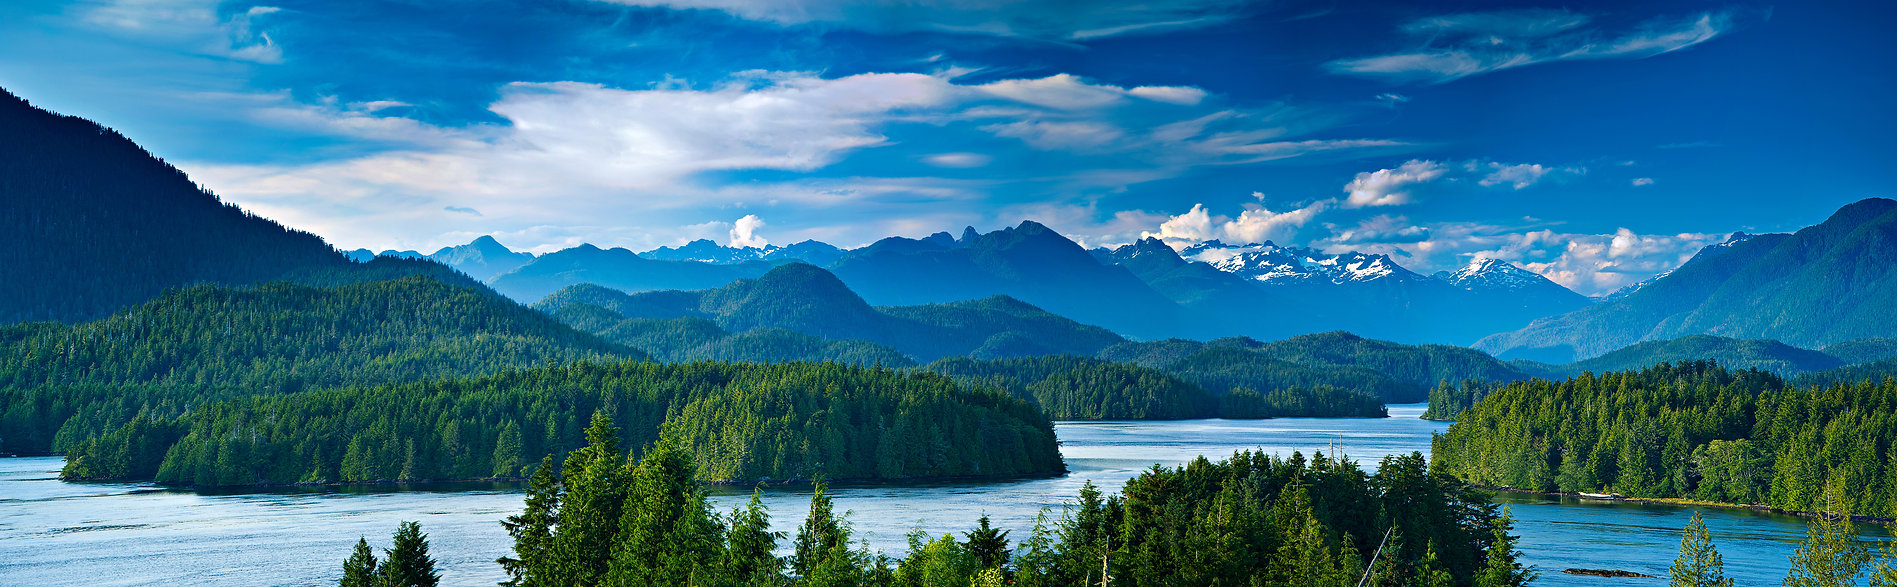 Vancouver Island, British Columbia Canada